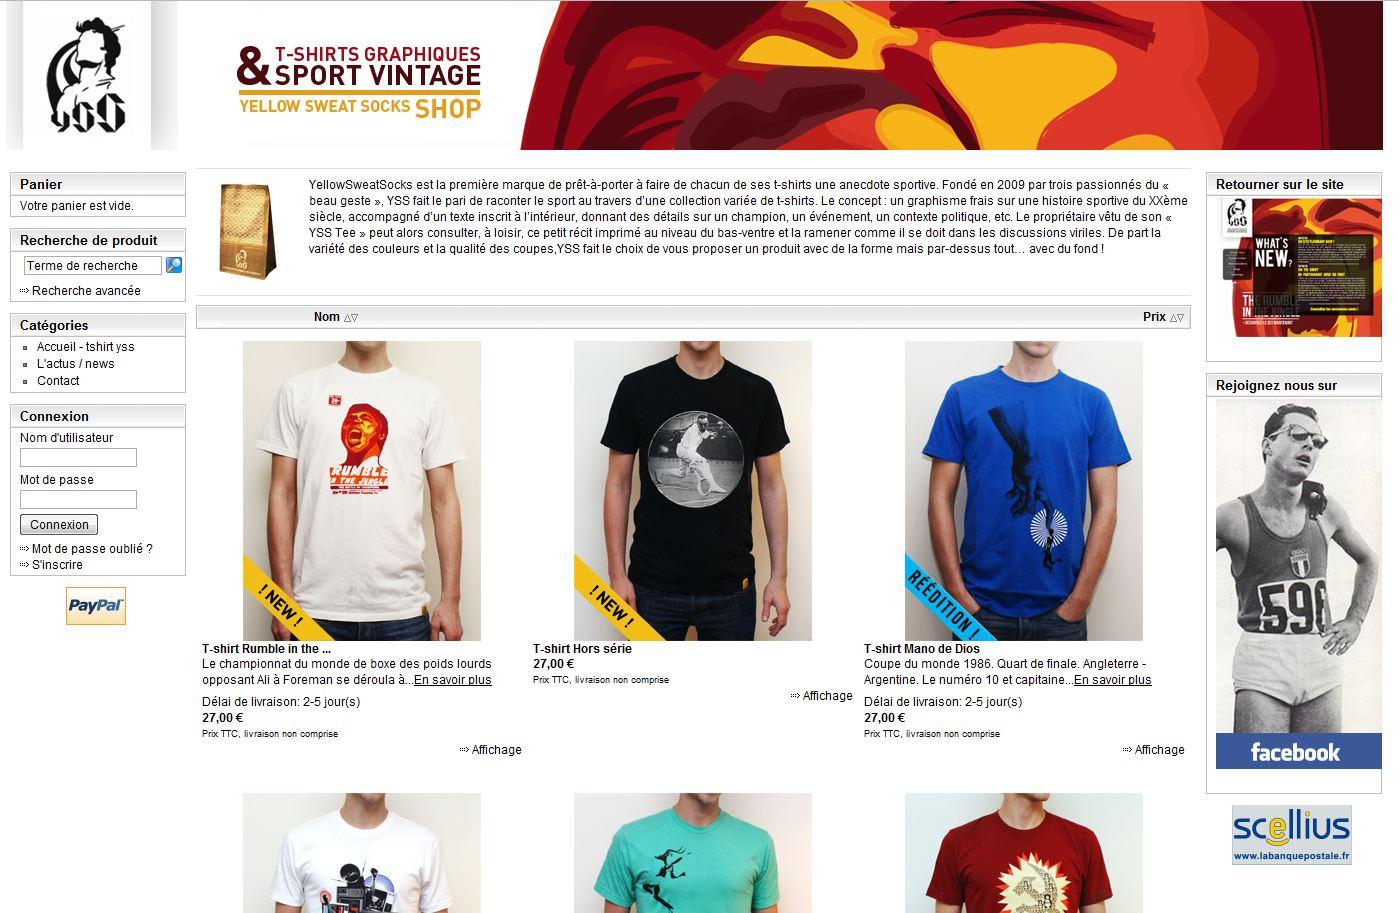 homepage yellowsweatsocks - 7 boutiques tournant sur Box E-commerce de la Poste